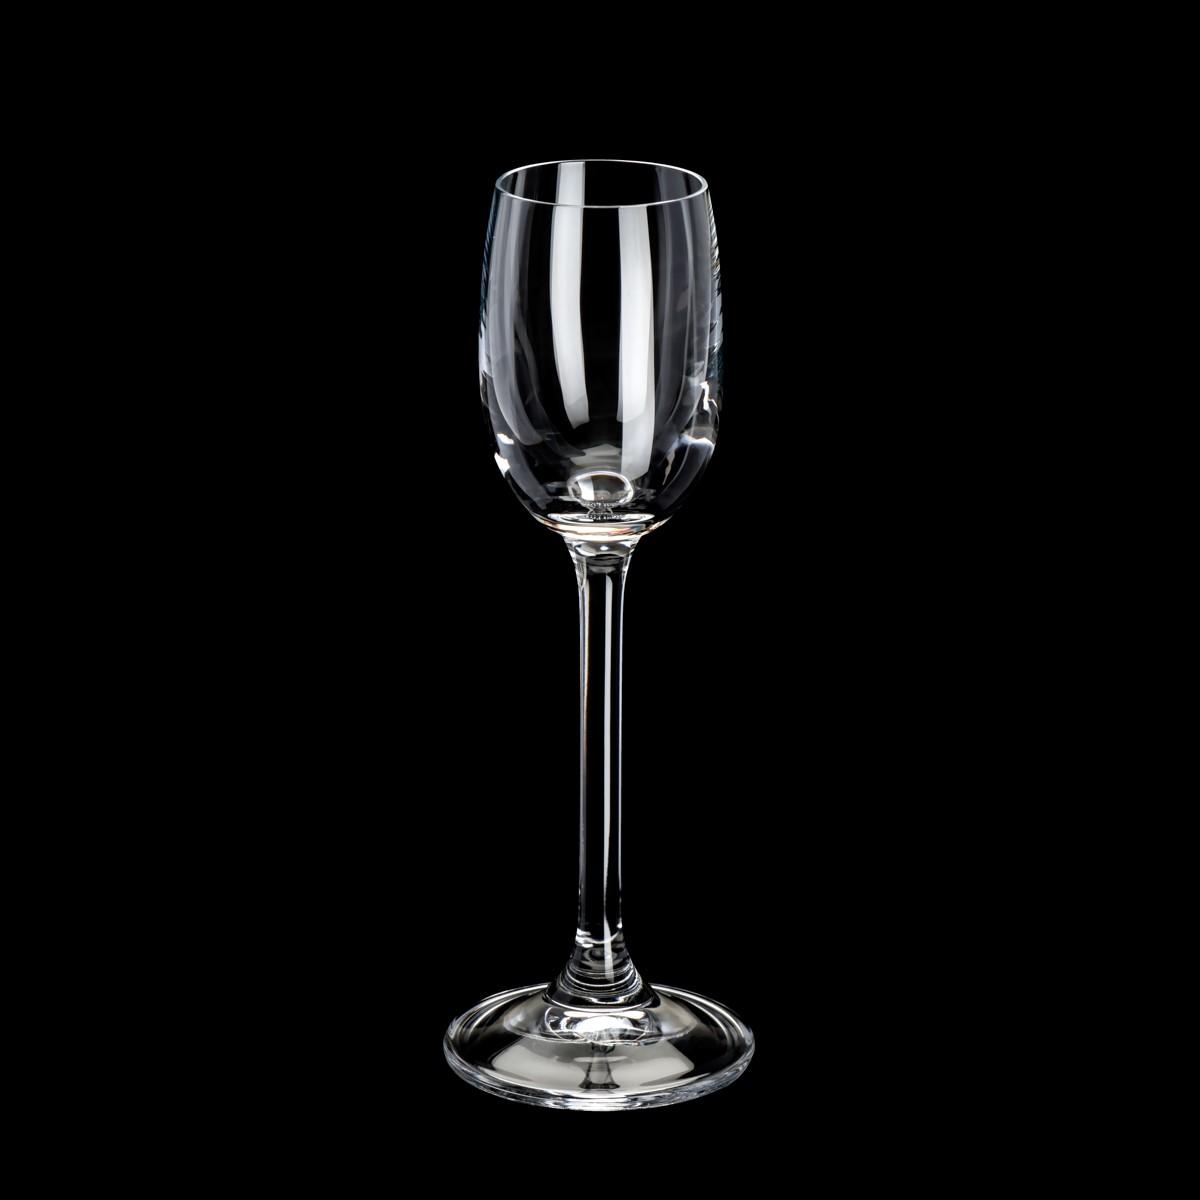 Conjunto de 6 Taças Cristal 60ml Ecológico para Licor Gastro/Colibri - Wolff